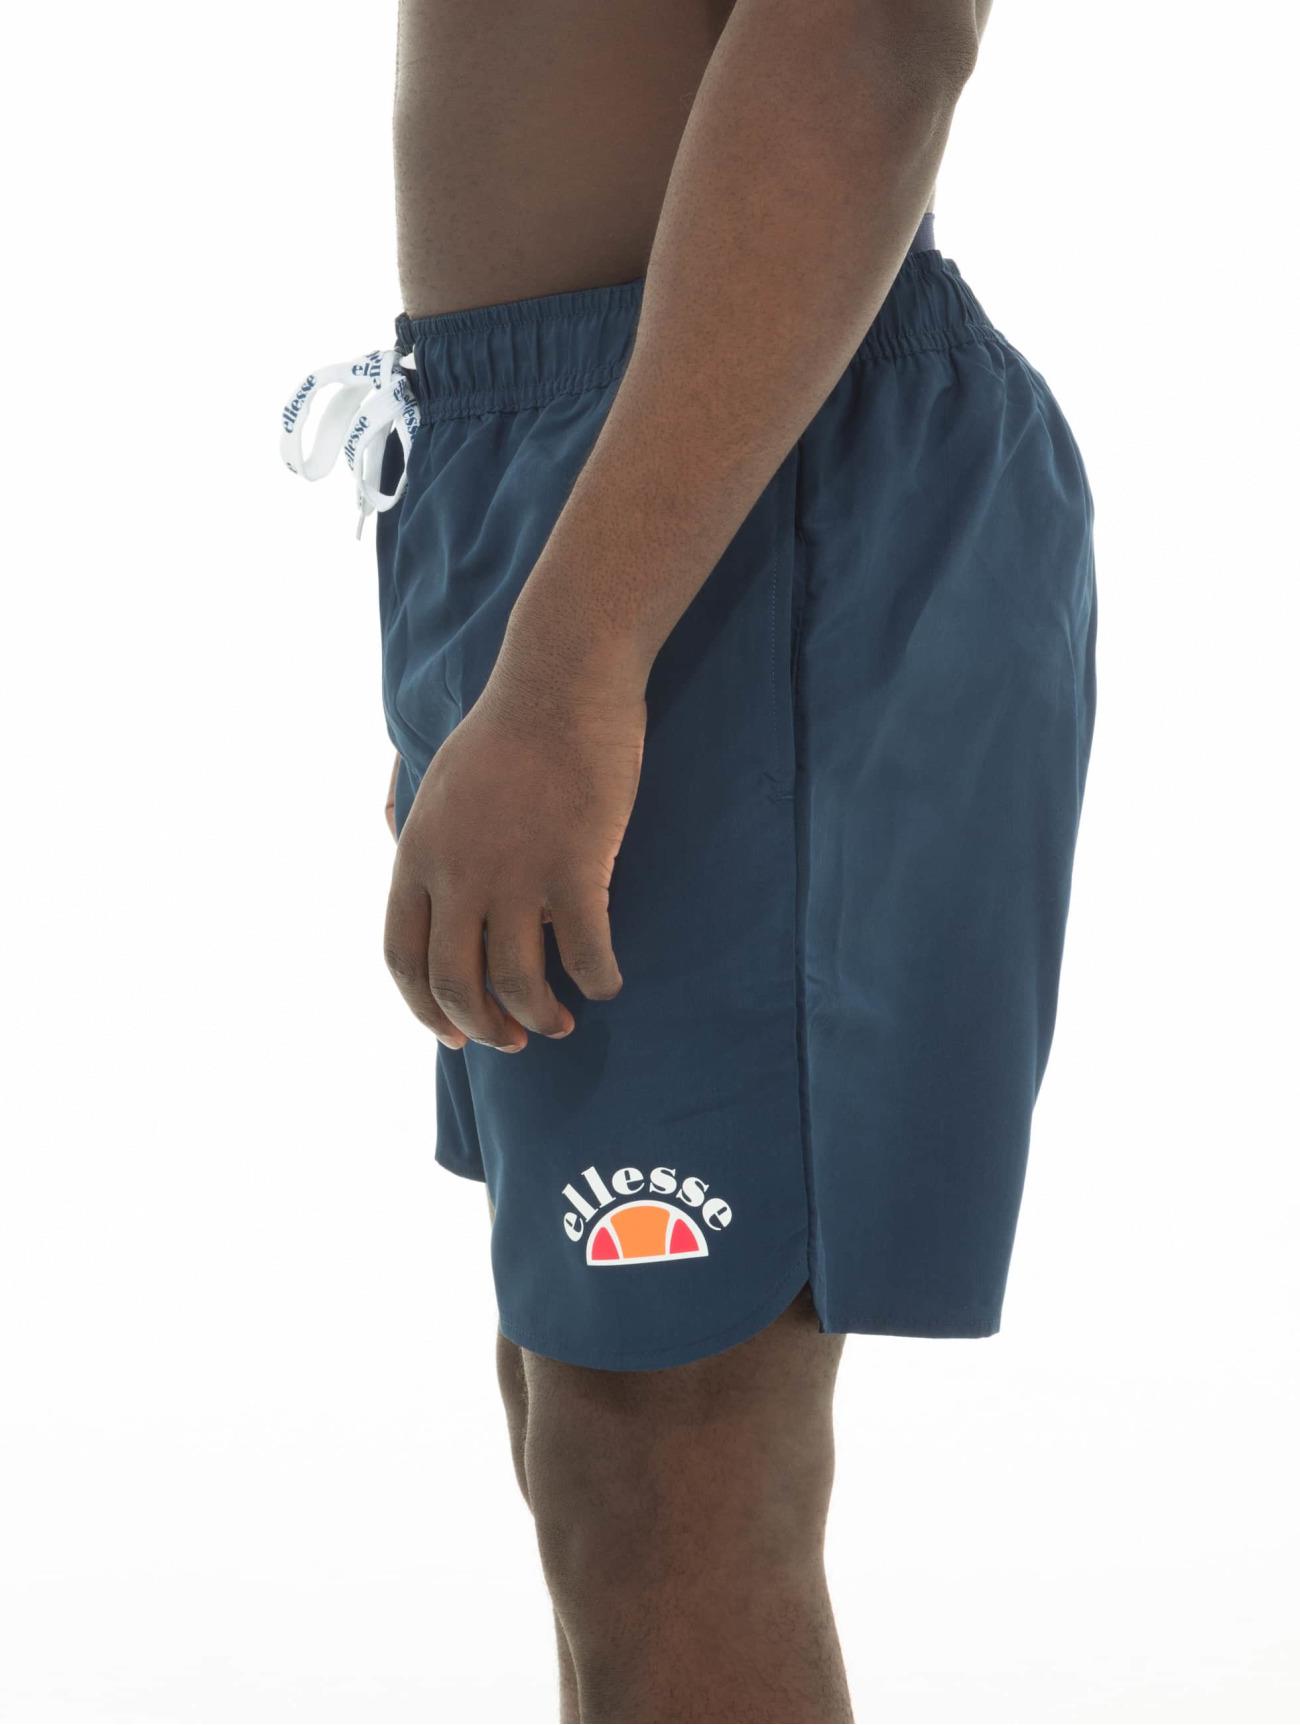 Ellesse  Nono  bleu Homme Short  663981 Homme Pantalons & Shorts